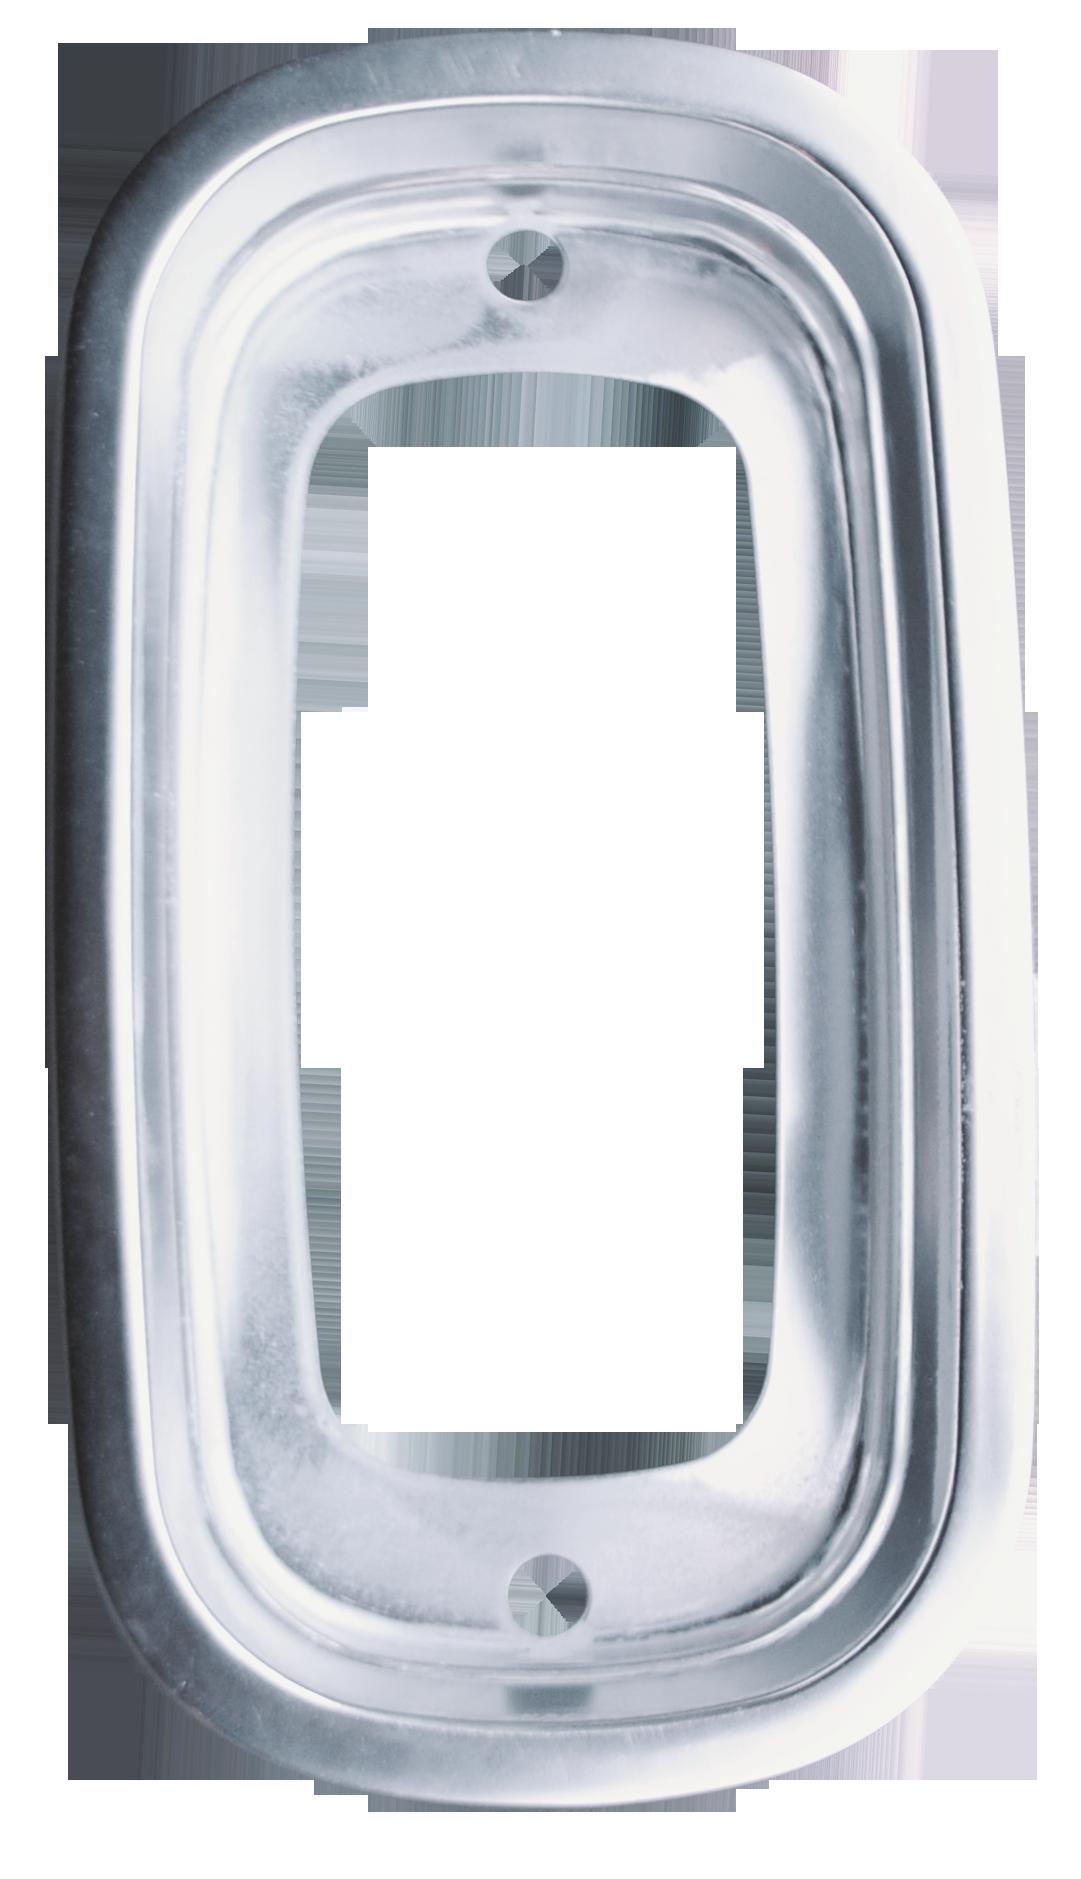 1960-66 C10 tail light bezel fleetside